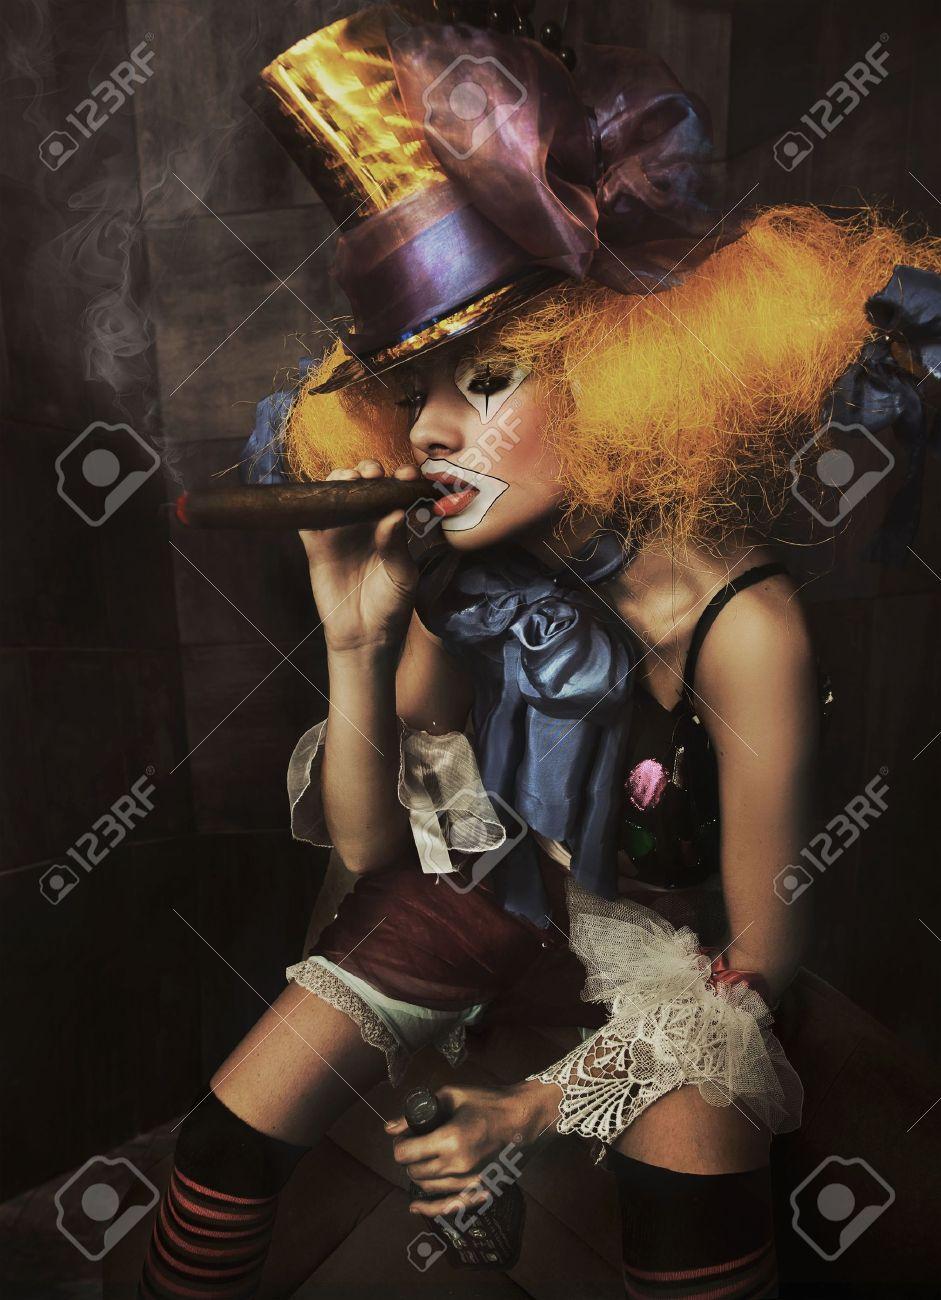 Fine art photo of a bad clown Stock Photo - 9189393